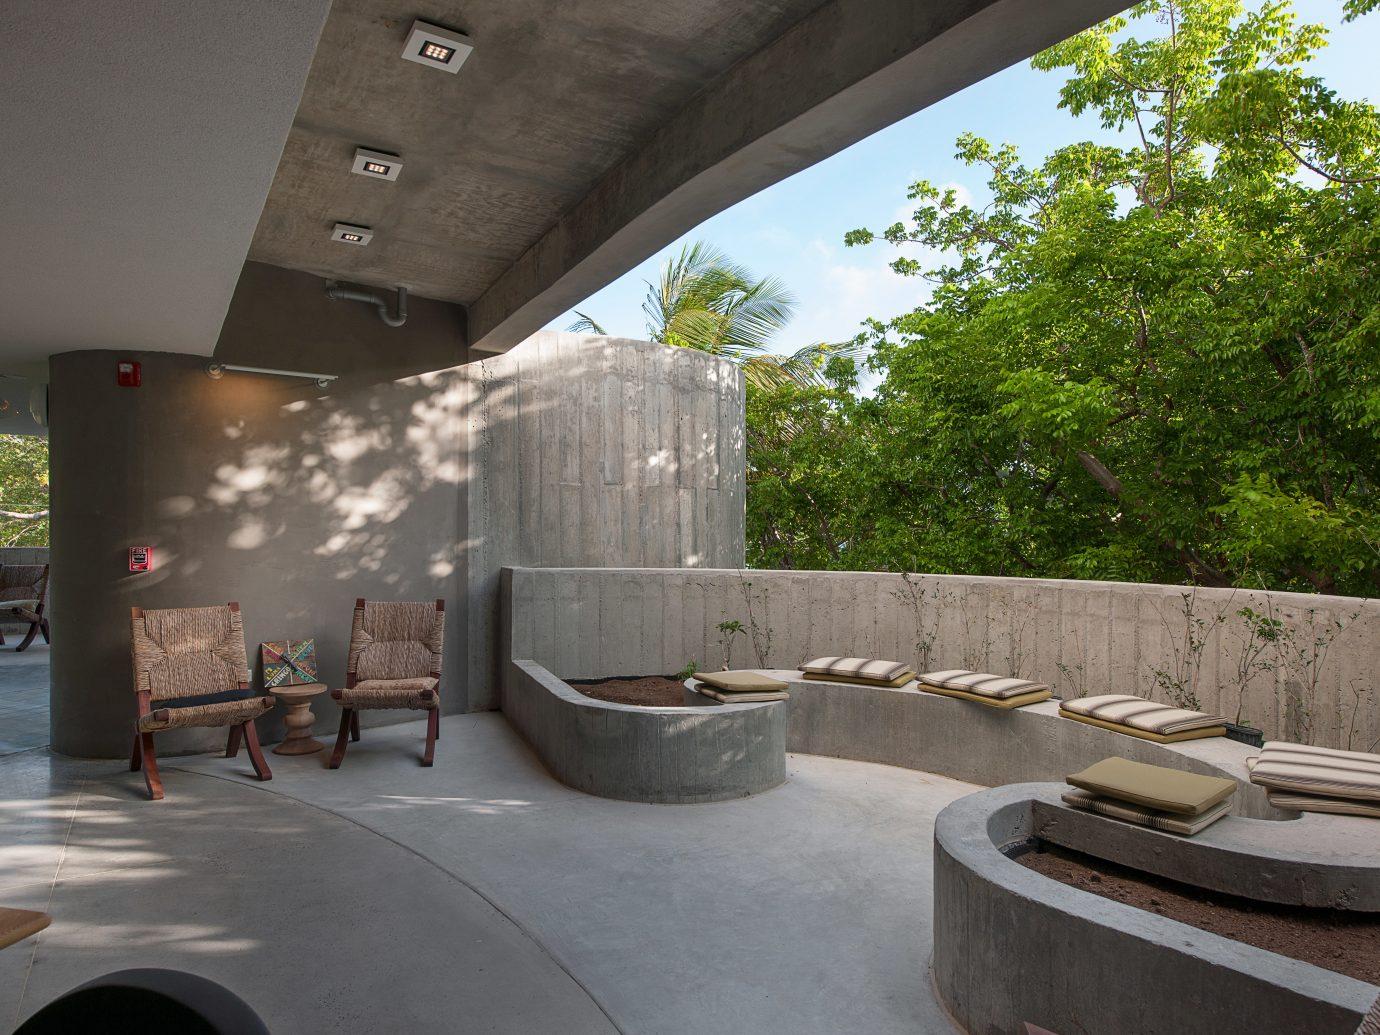 Boutique Design Hip Living Modern Trip Ideas tree property Architecture estate swimming pool tourist attraction interior design stone